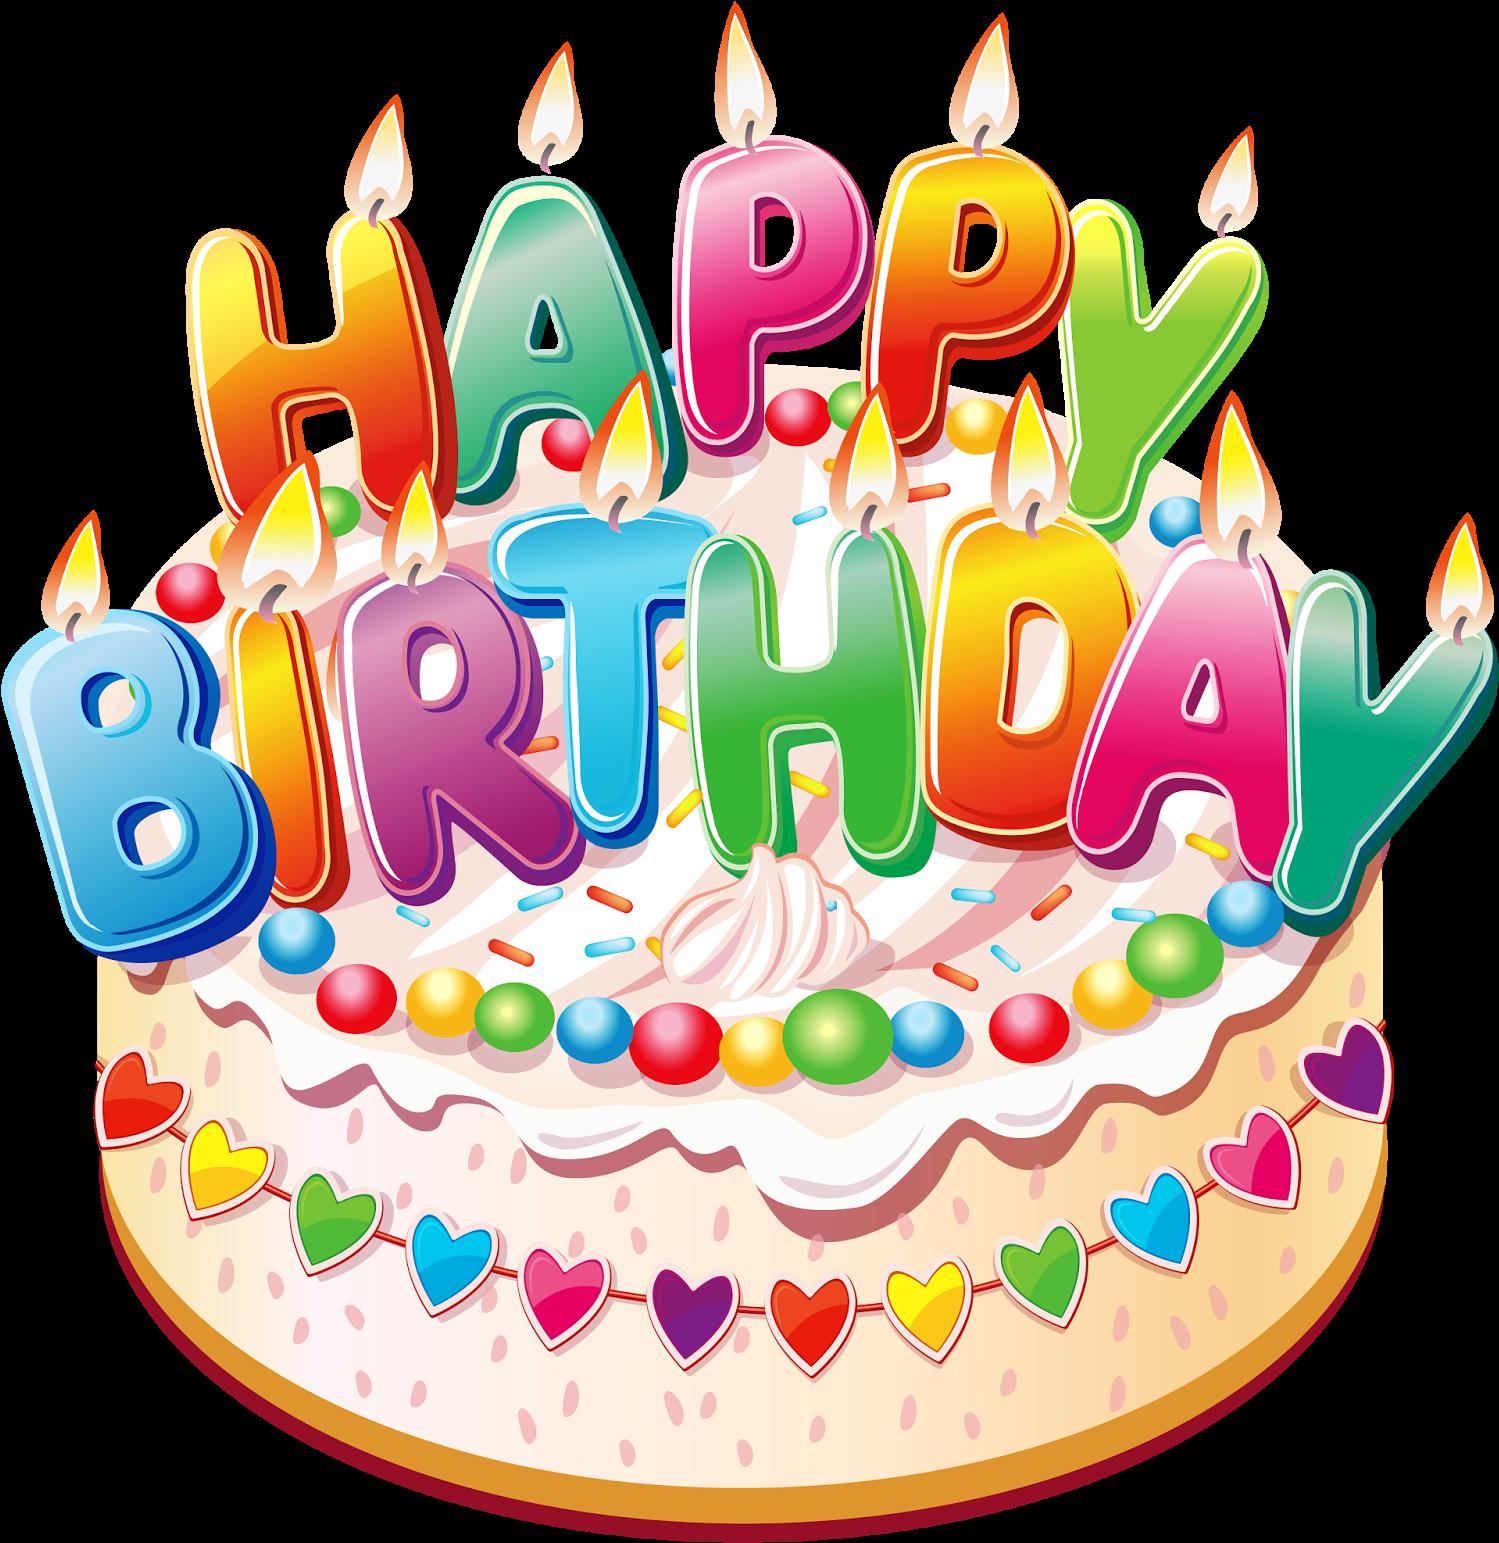 A Jewish Minute Happy Birthday Cake Png Hd (1575x1600